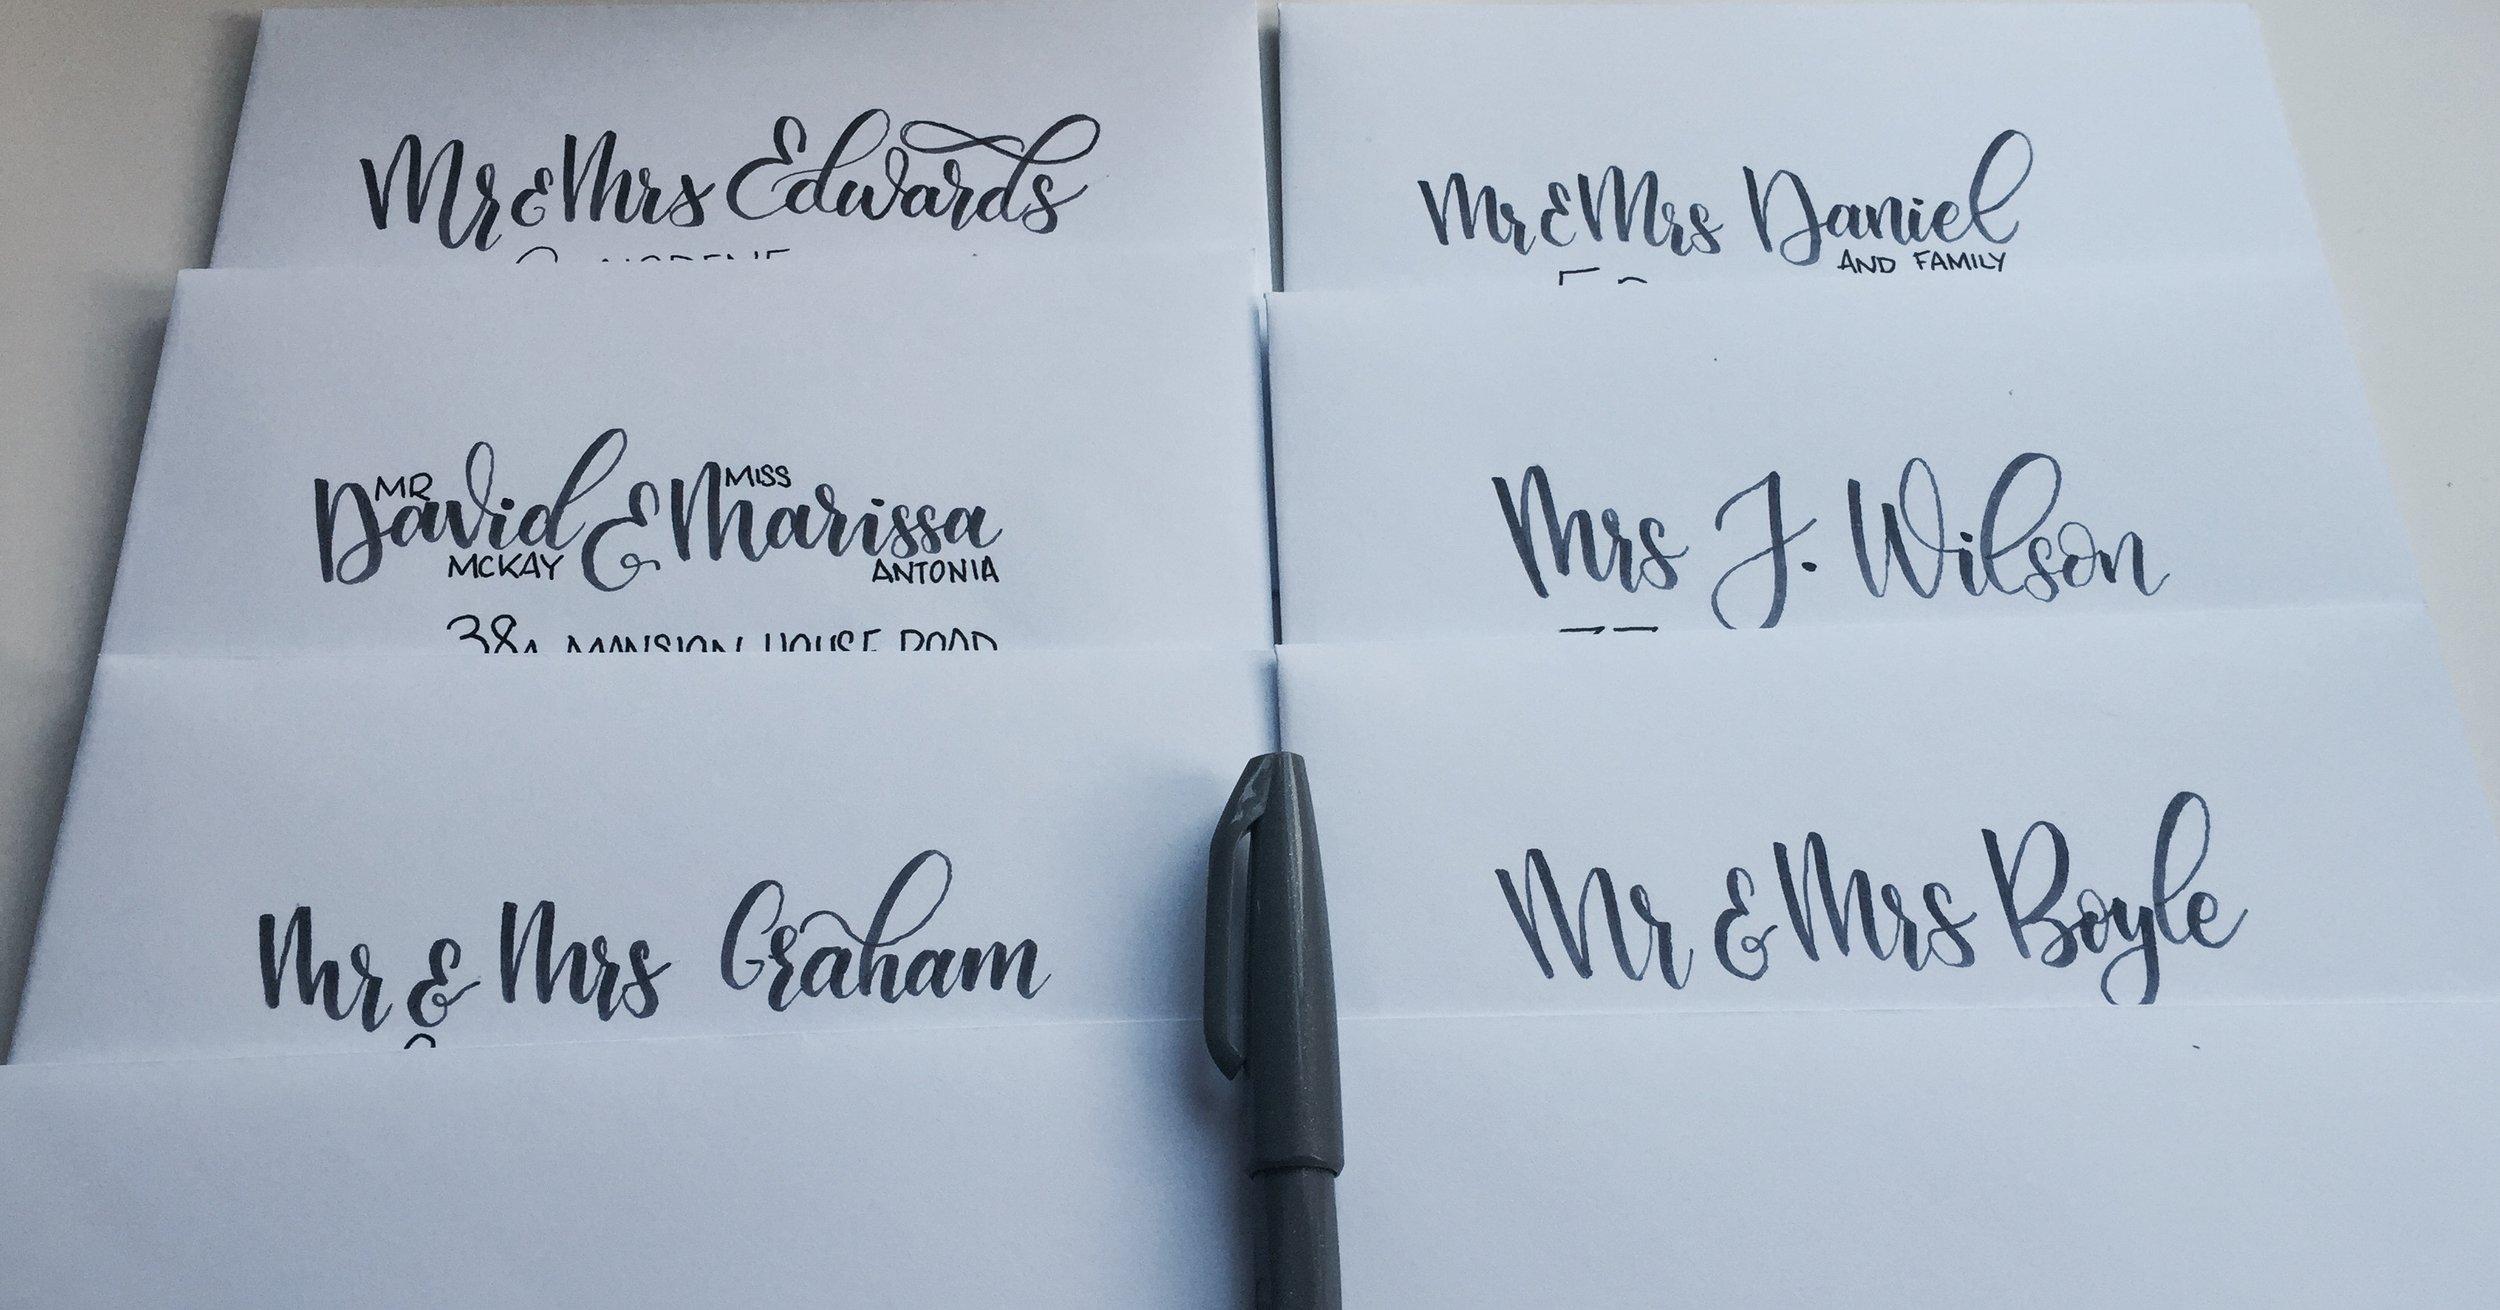 Envelopes too!